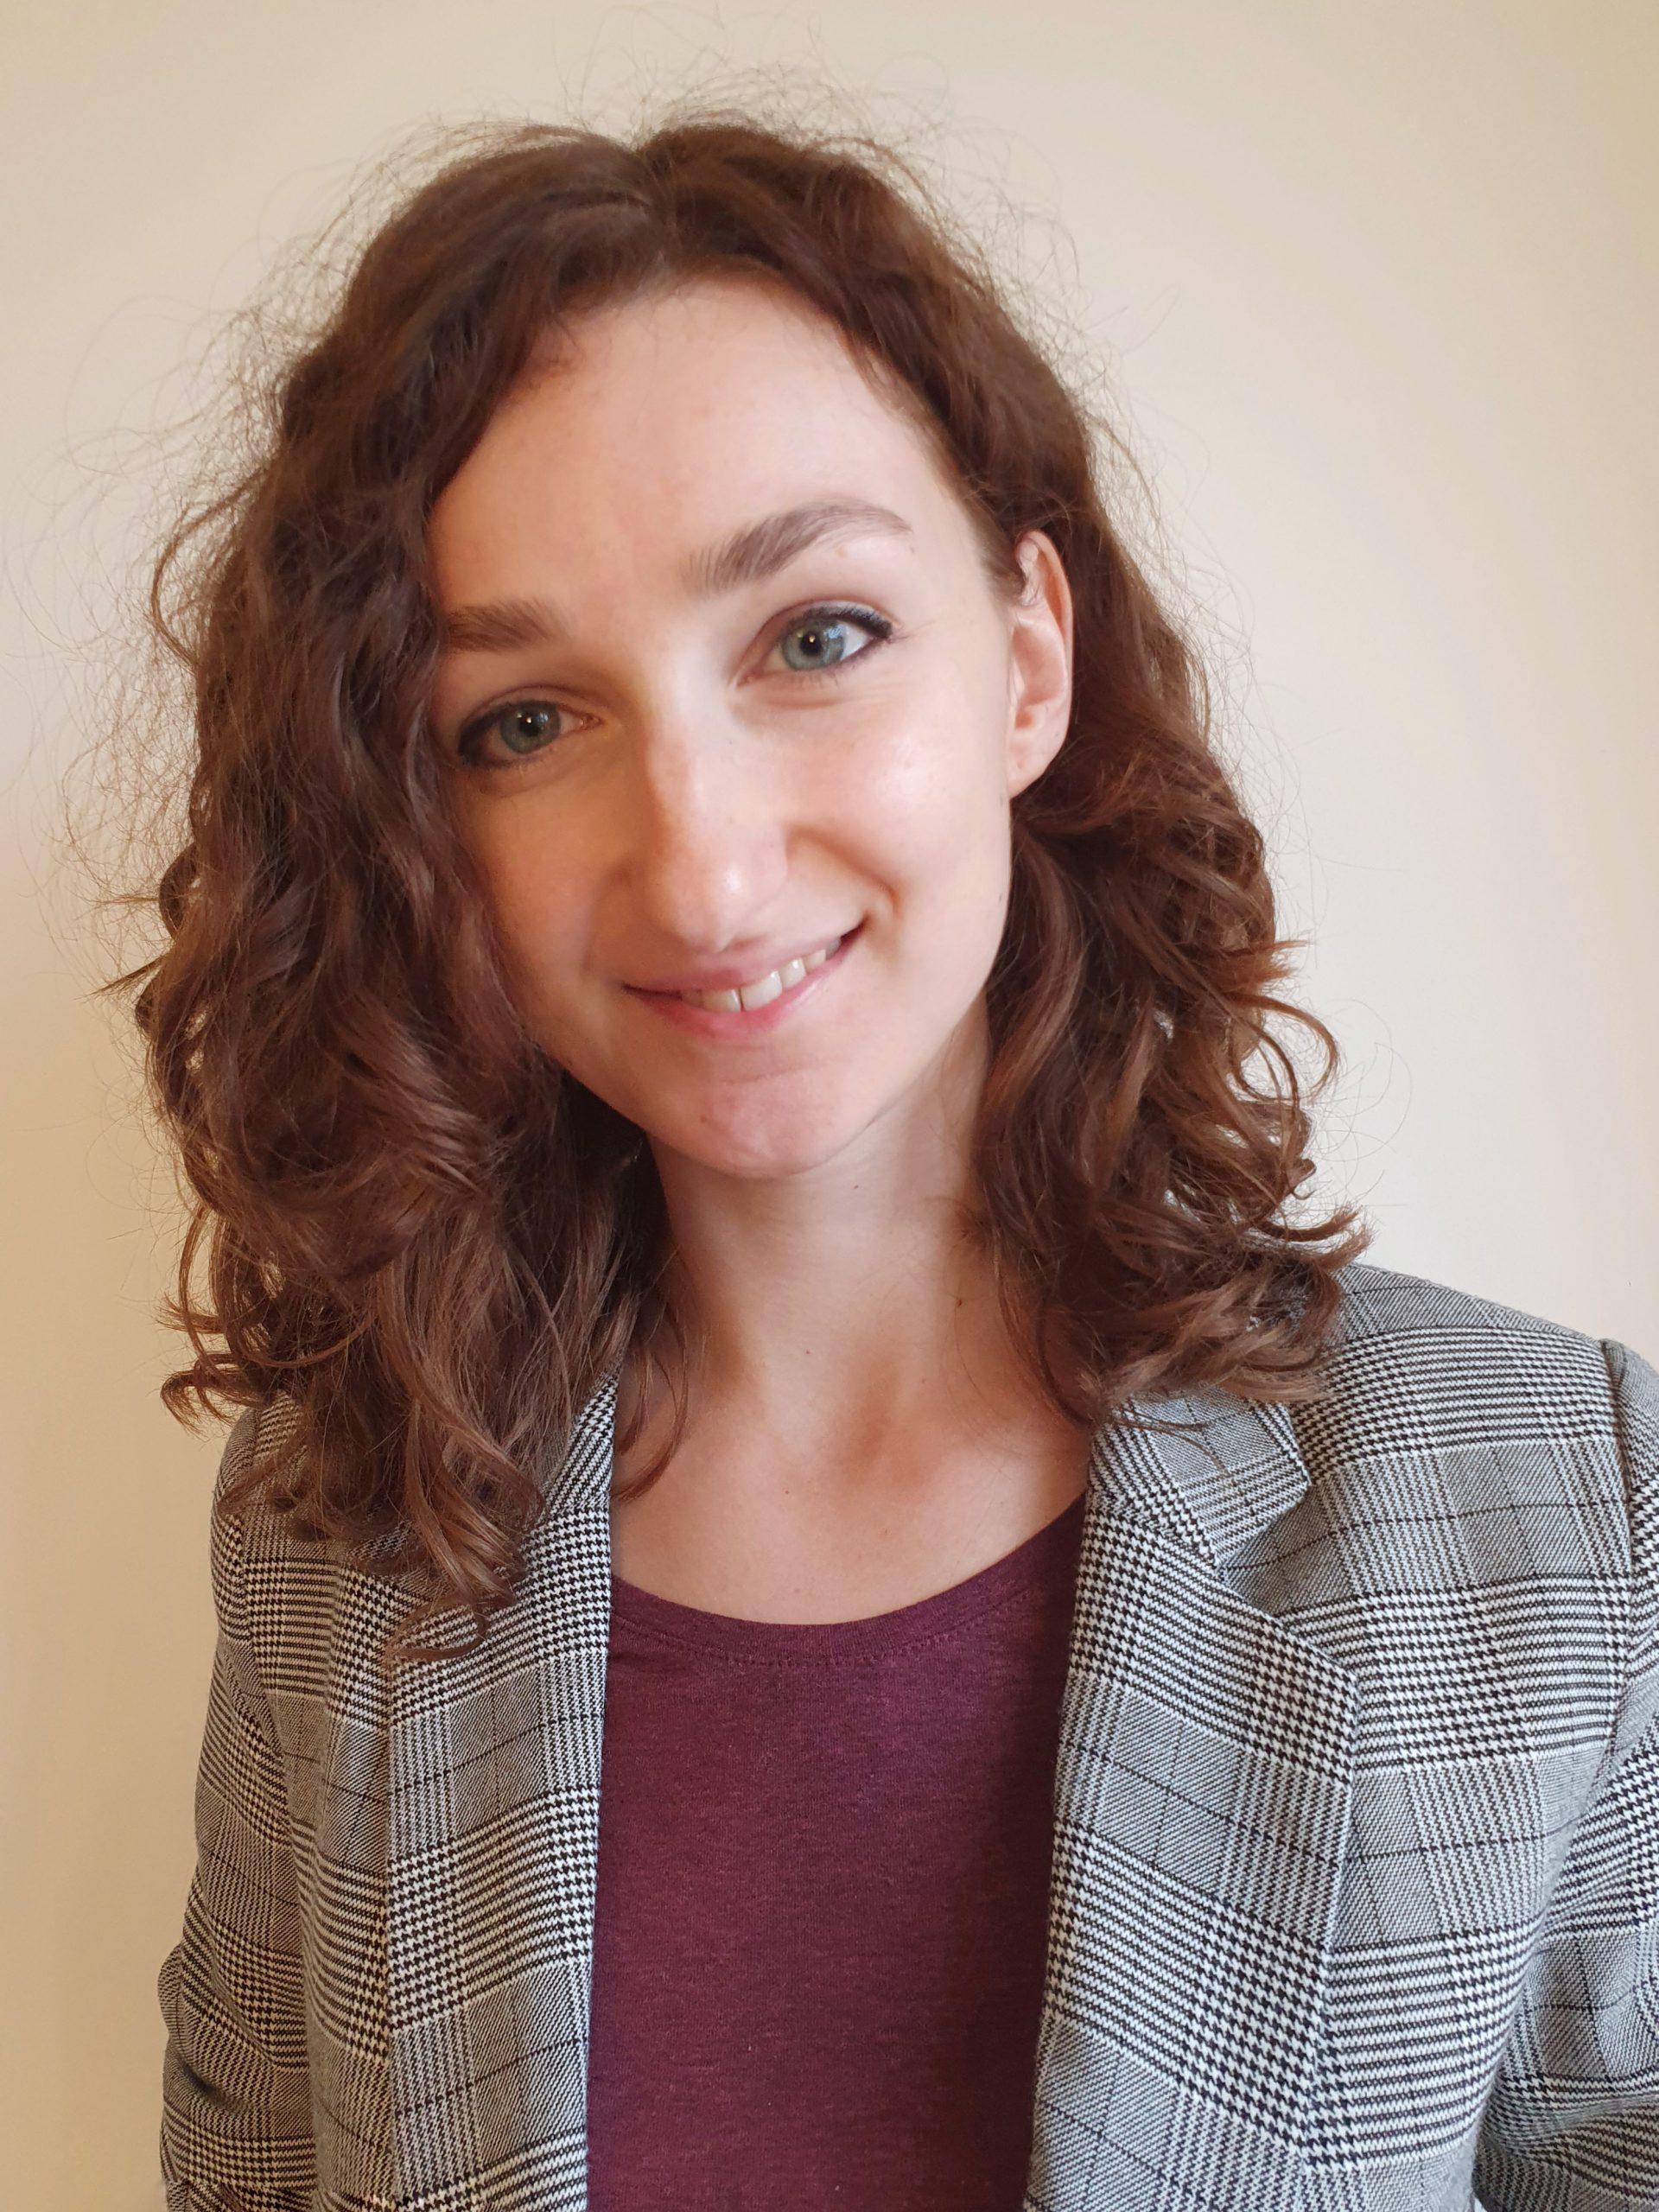 Marta Zwierz content manager